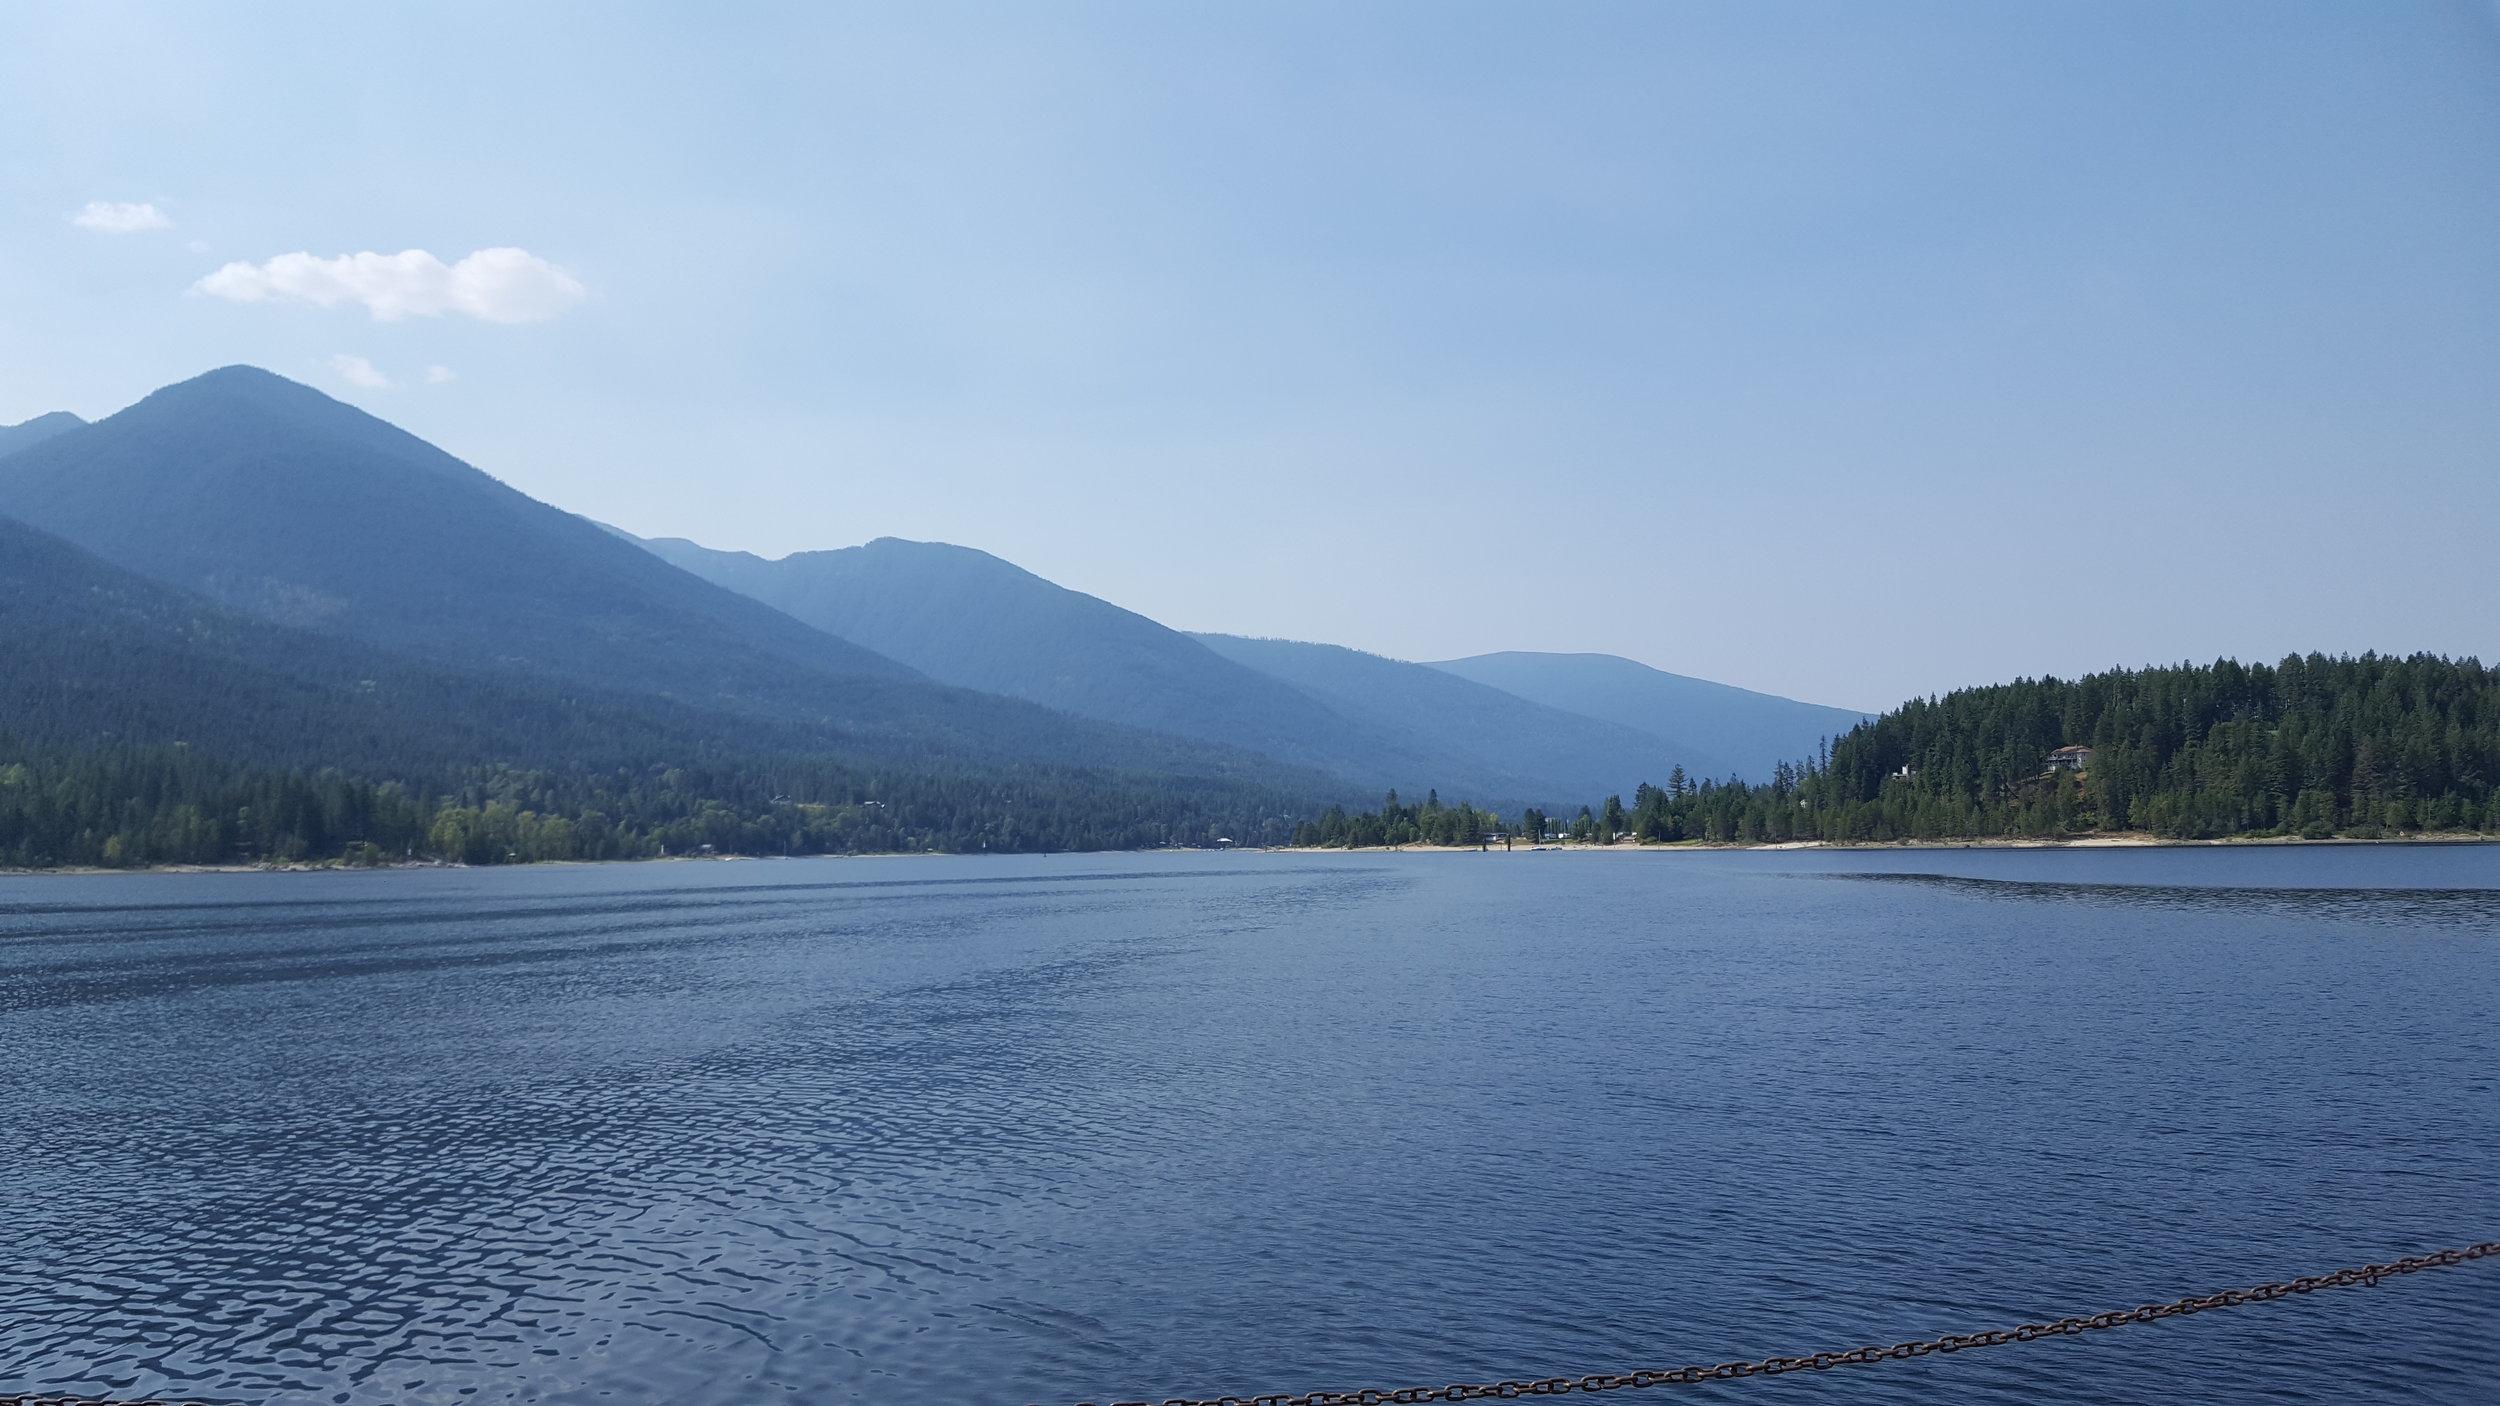 Ferry views of Kootenay Lake